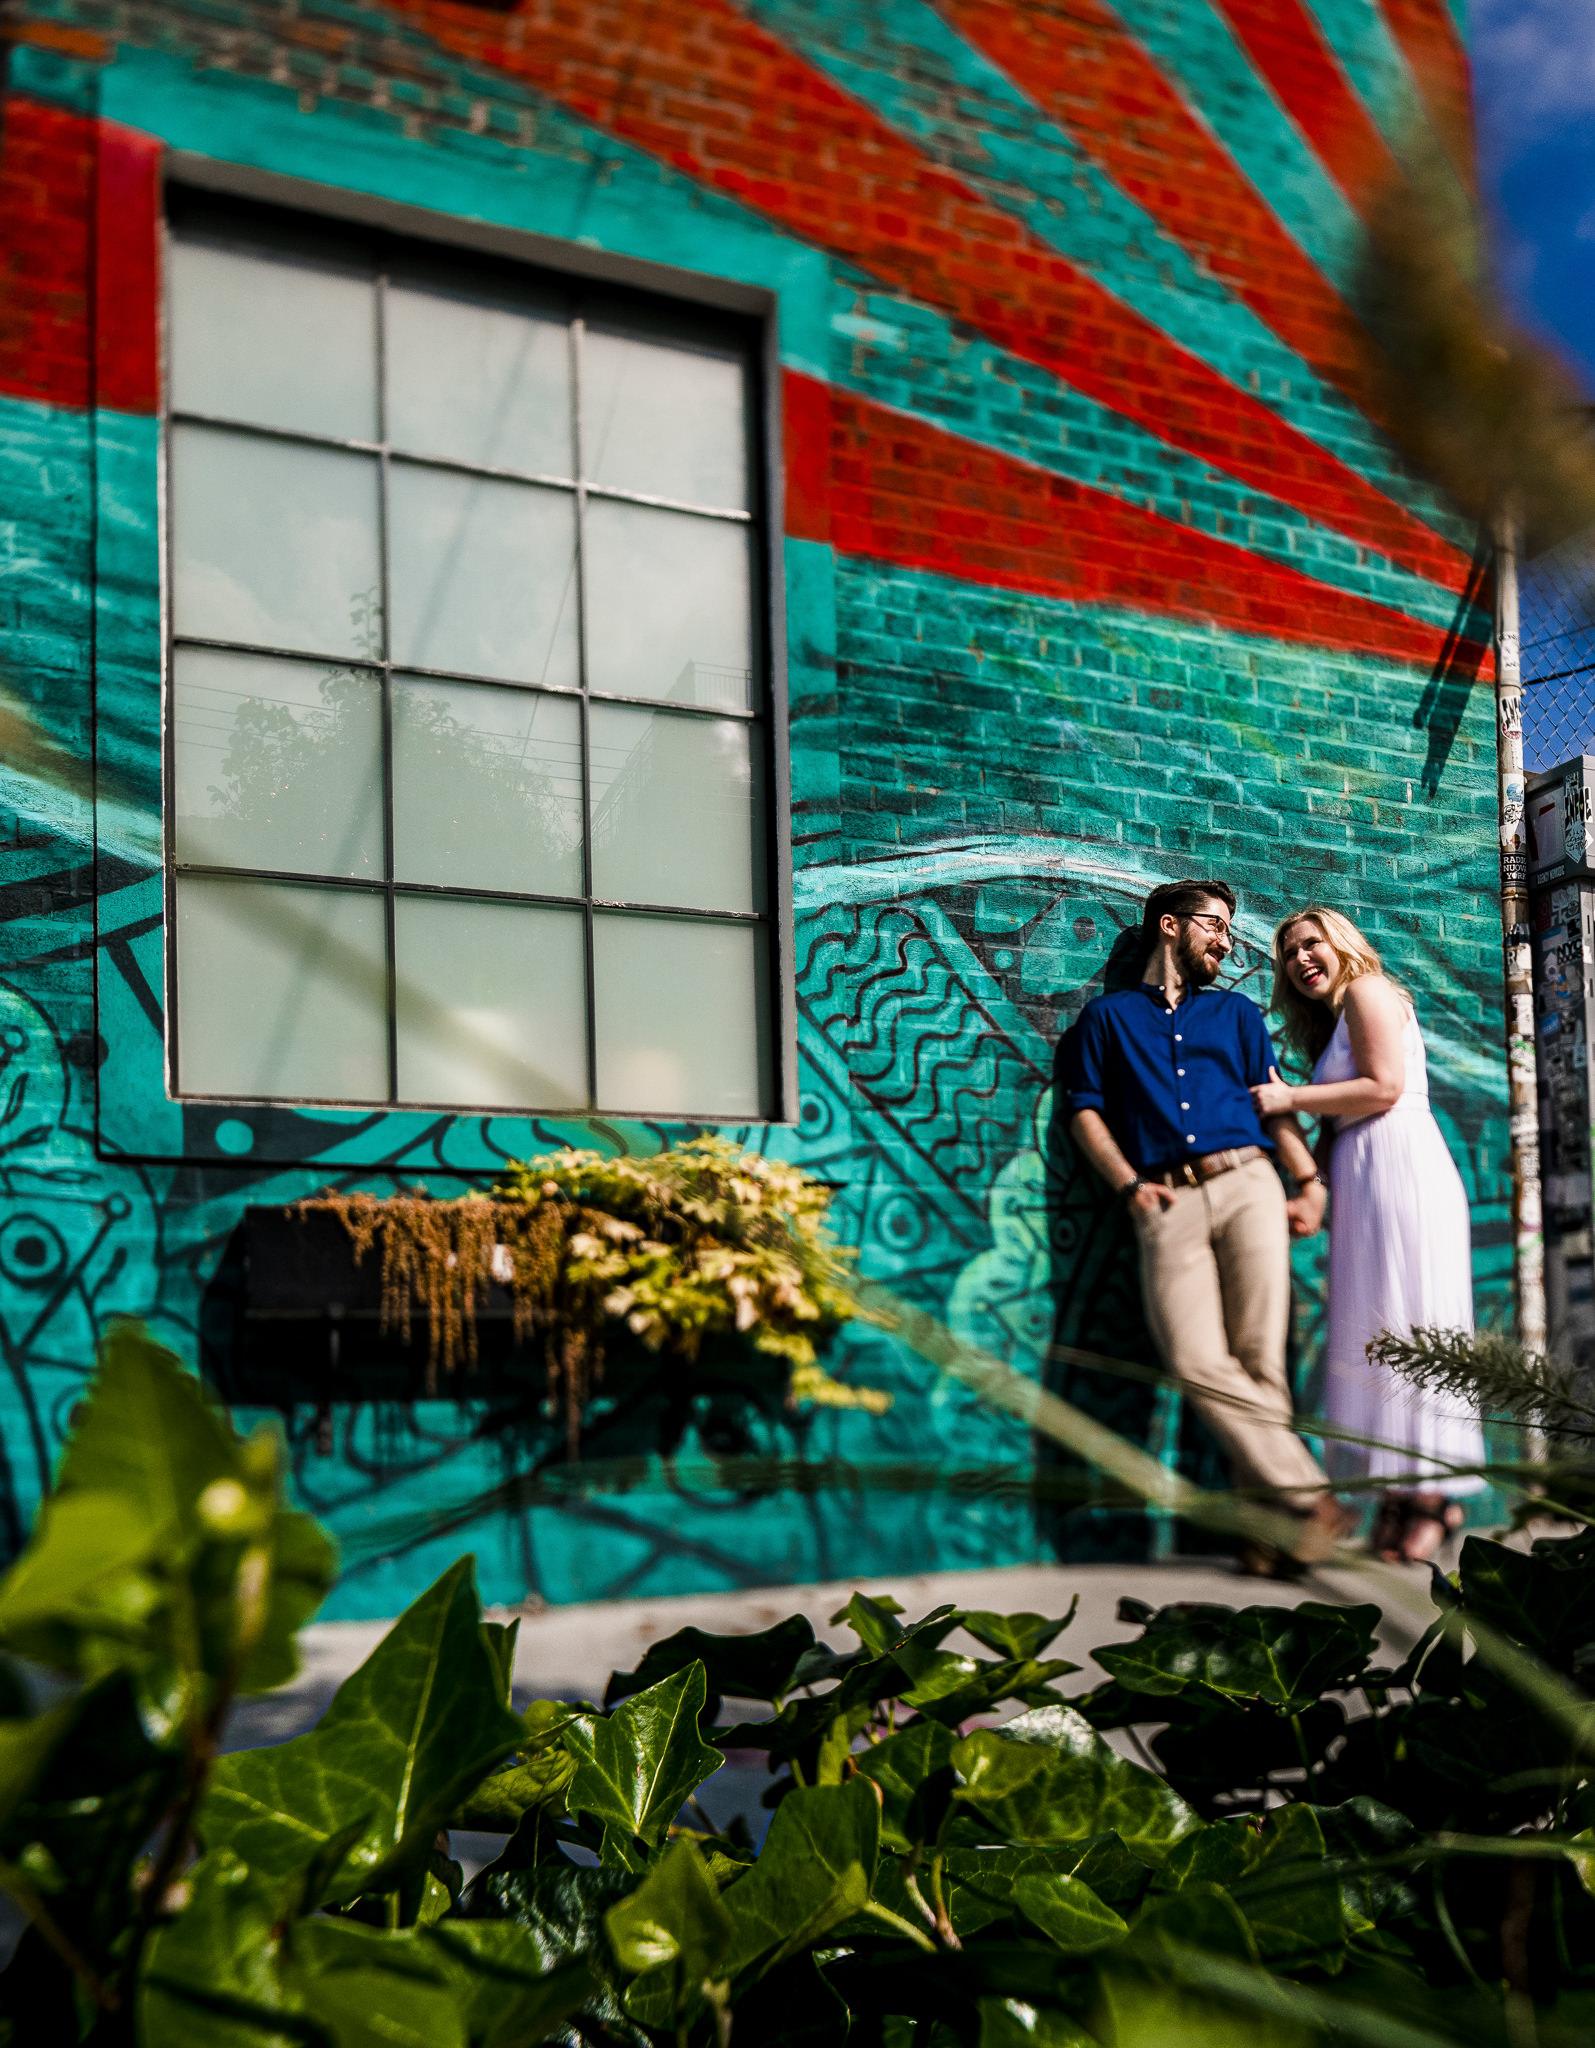 Arena-Brooklyn-New-York-Engagement-Photos-04.jpg